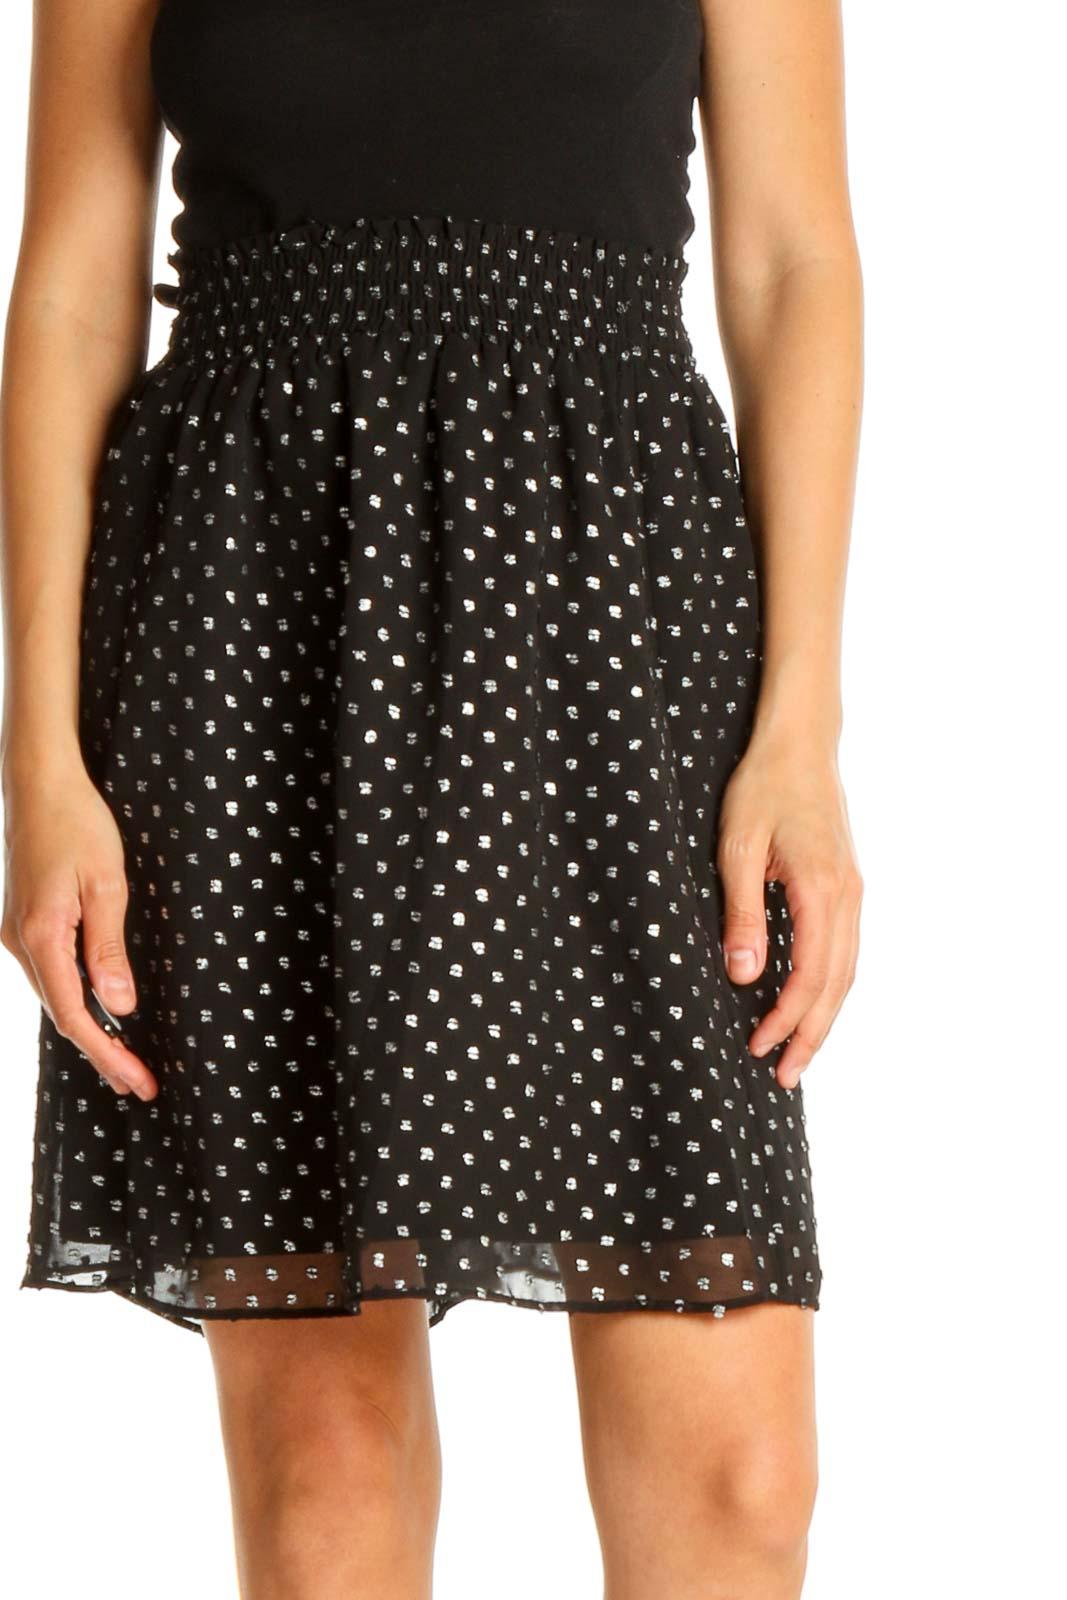 Black Polka Dot Retro A-Line Skirt Front